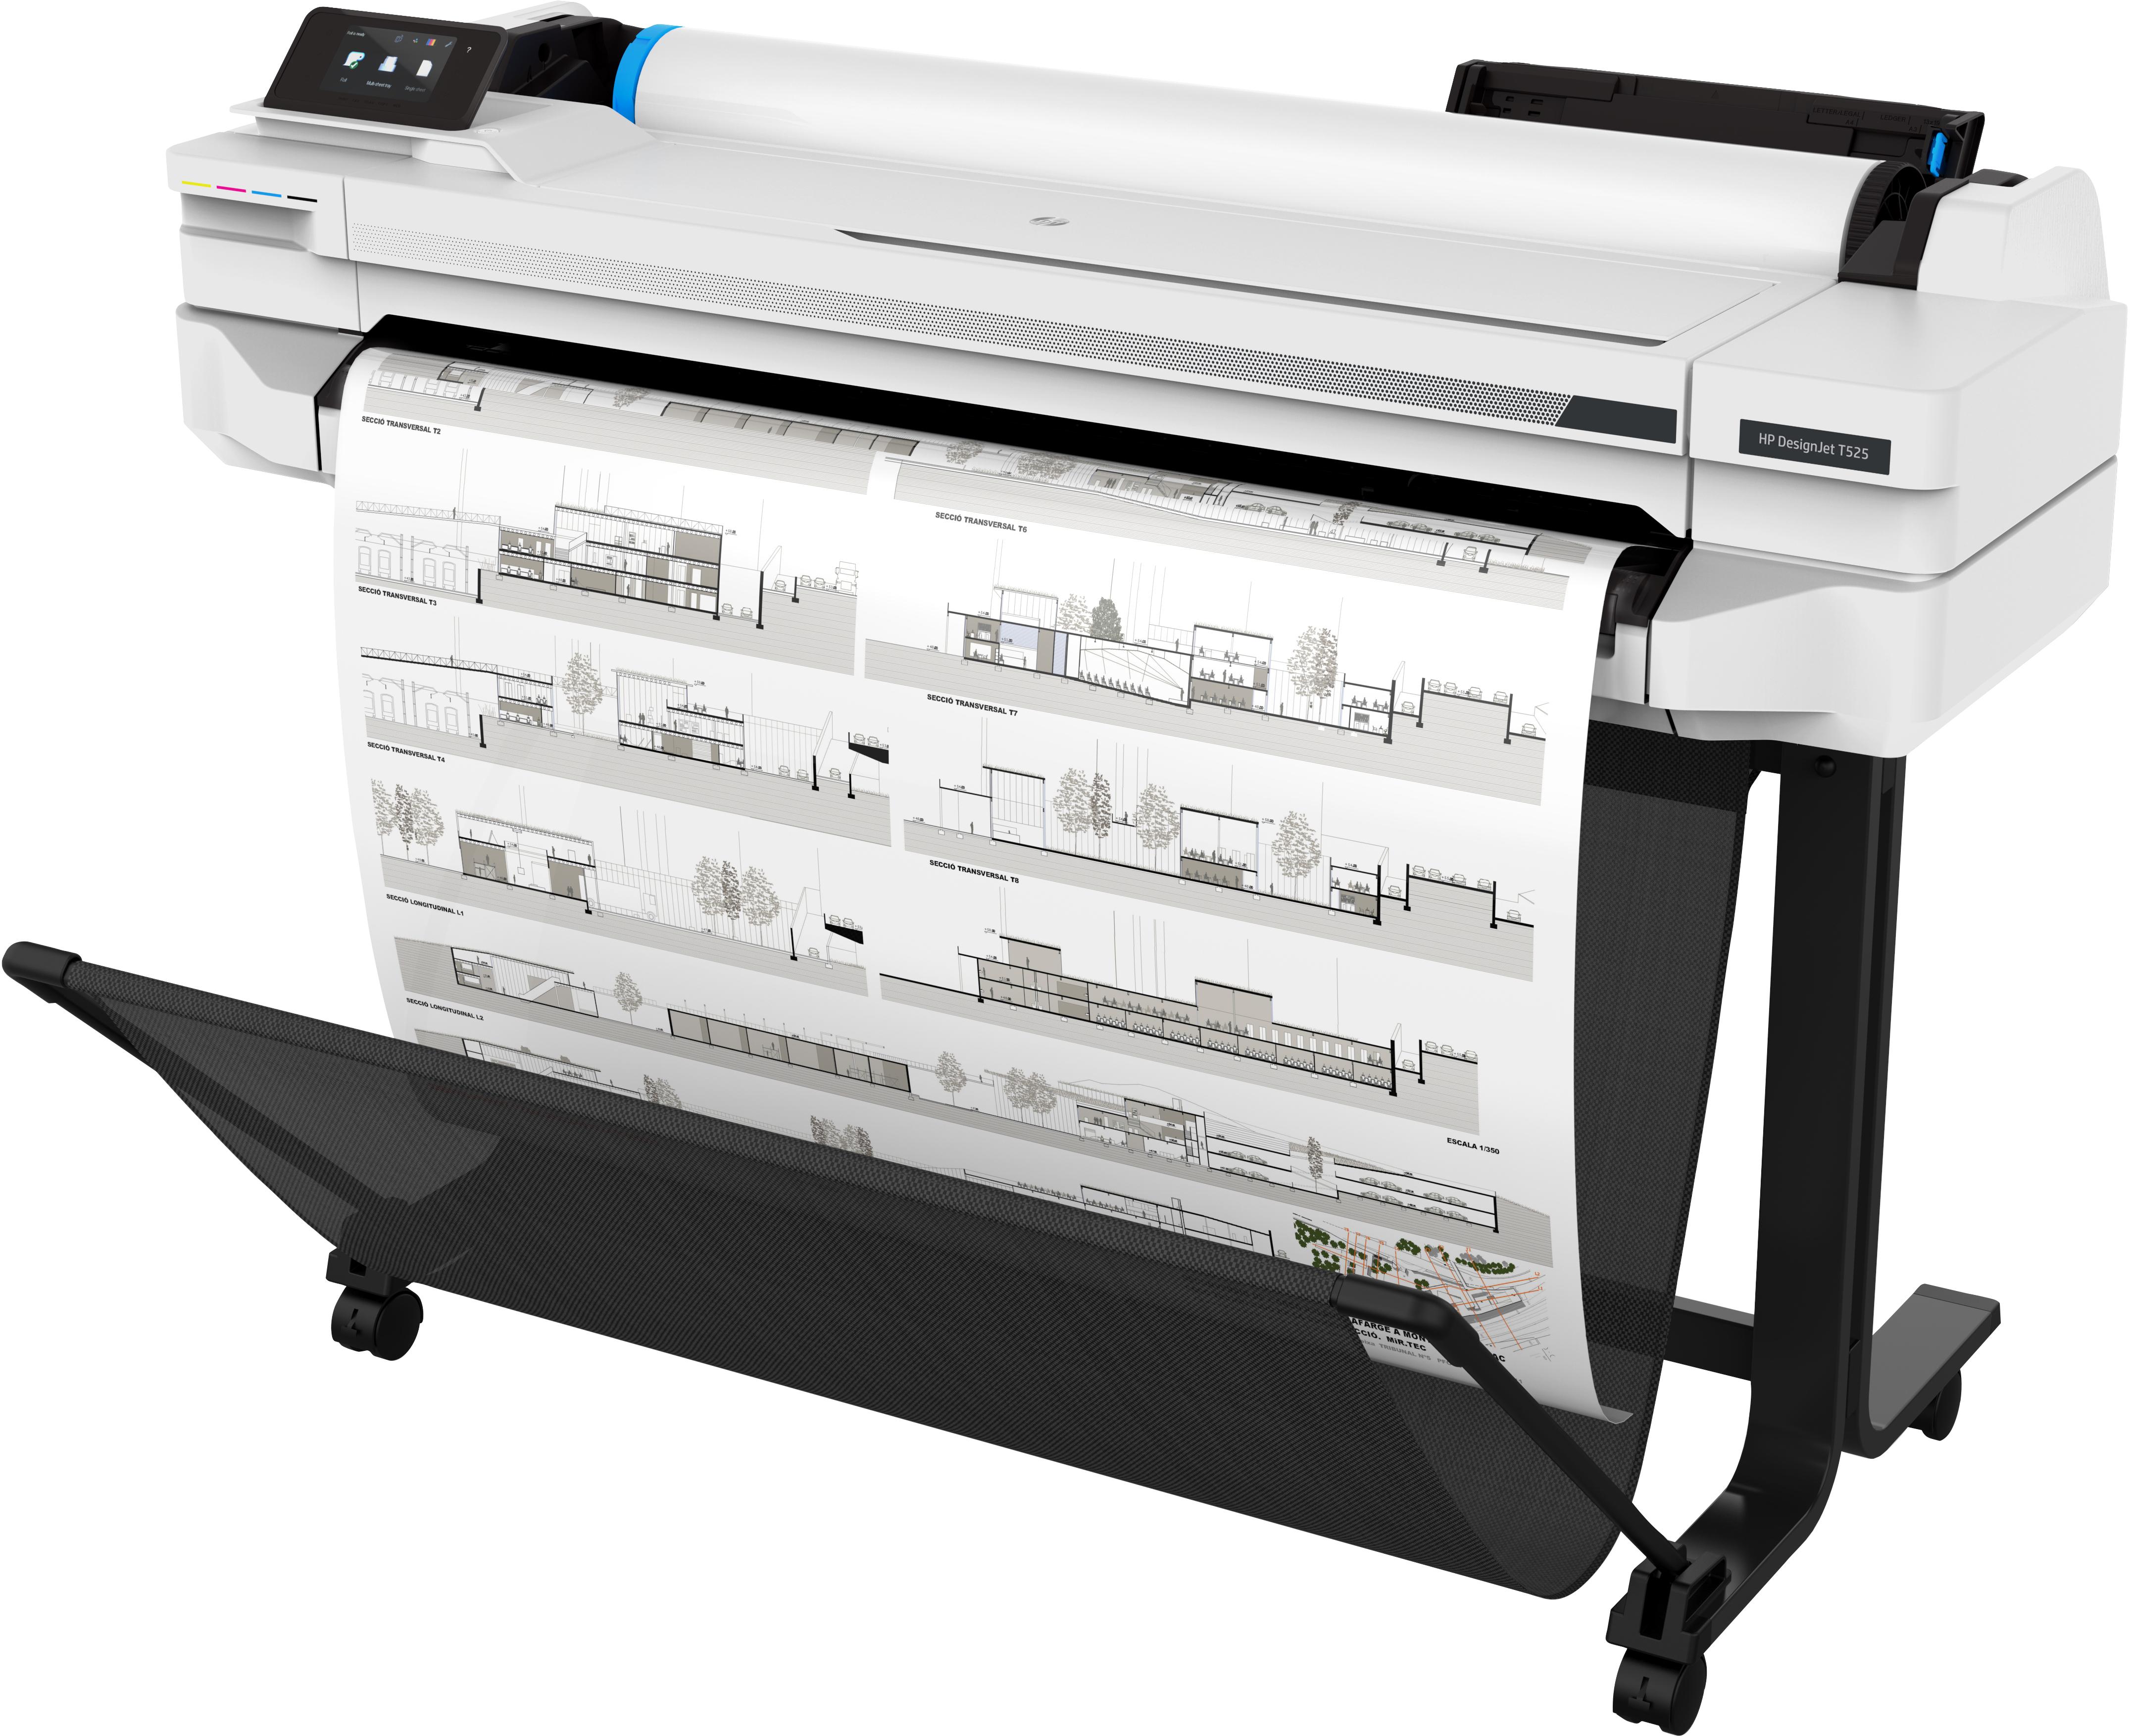 HP Großformatdrucker DesignJet T525 - 36 - Großformatdrucker - Tintenstrahldruck